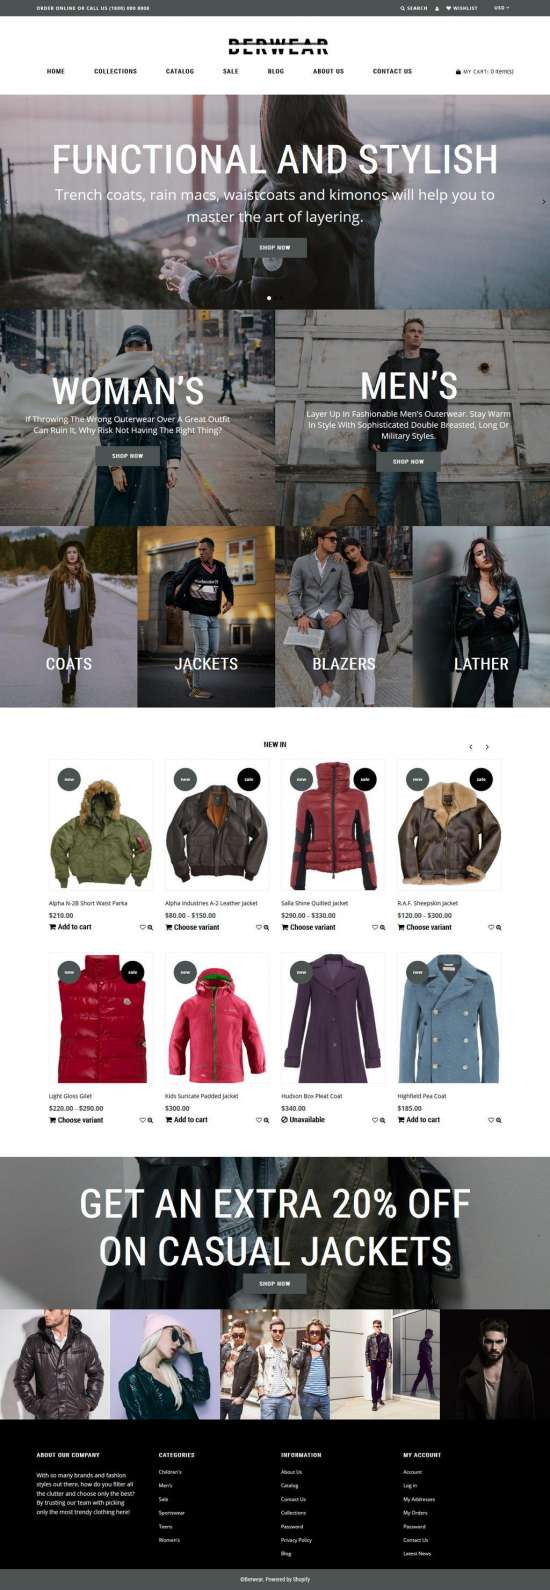 berwear shopify theme 01 550x1590 - Berwear Shopify Theme